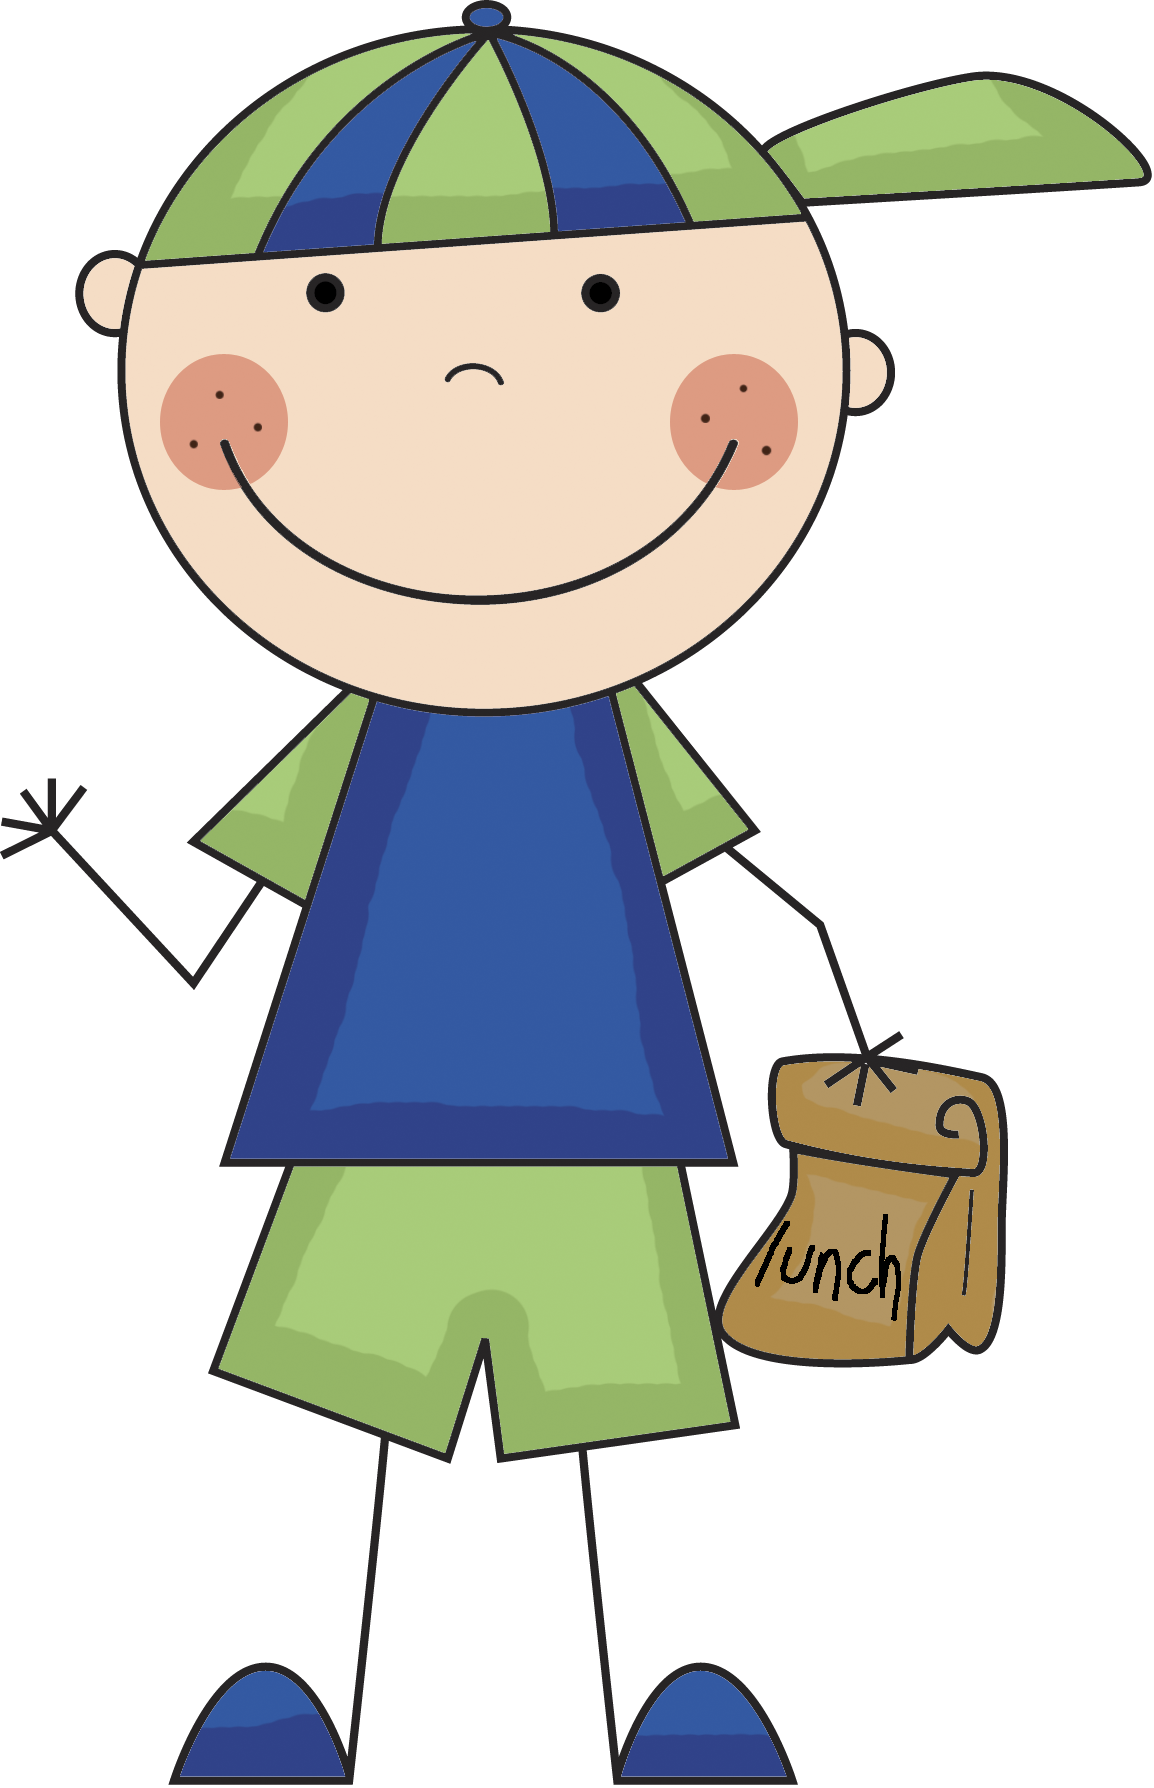 Lunch kindergarten clipart svg free School Snack Clipart - Clipart Kid svg free